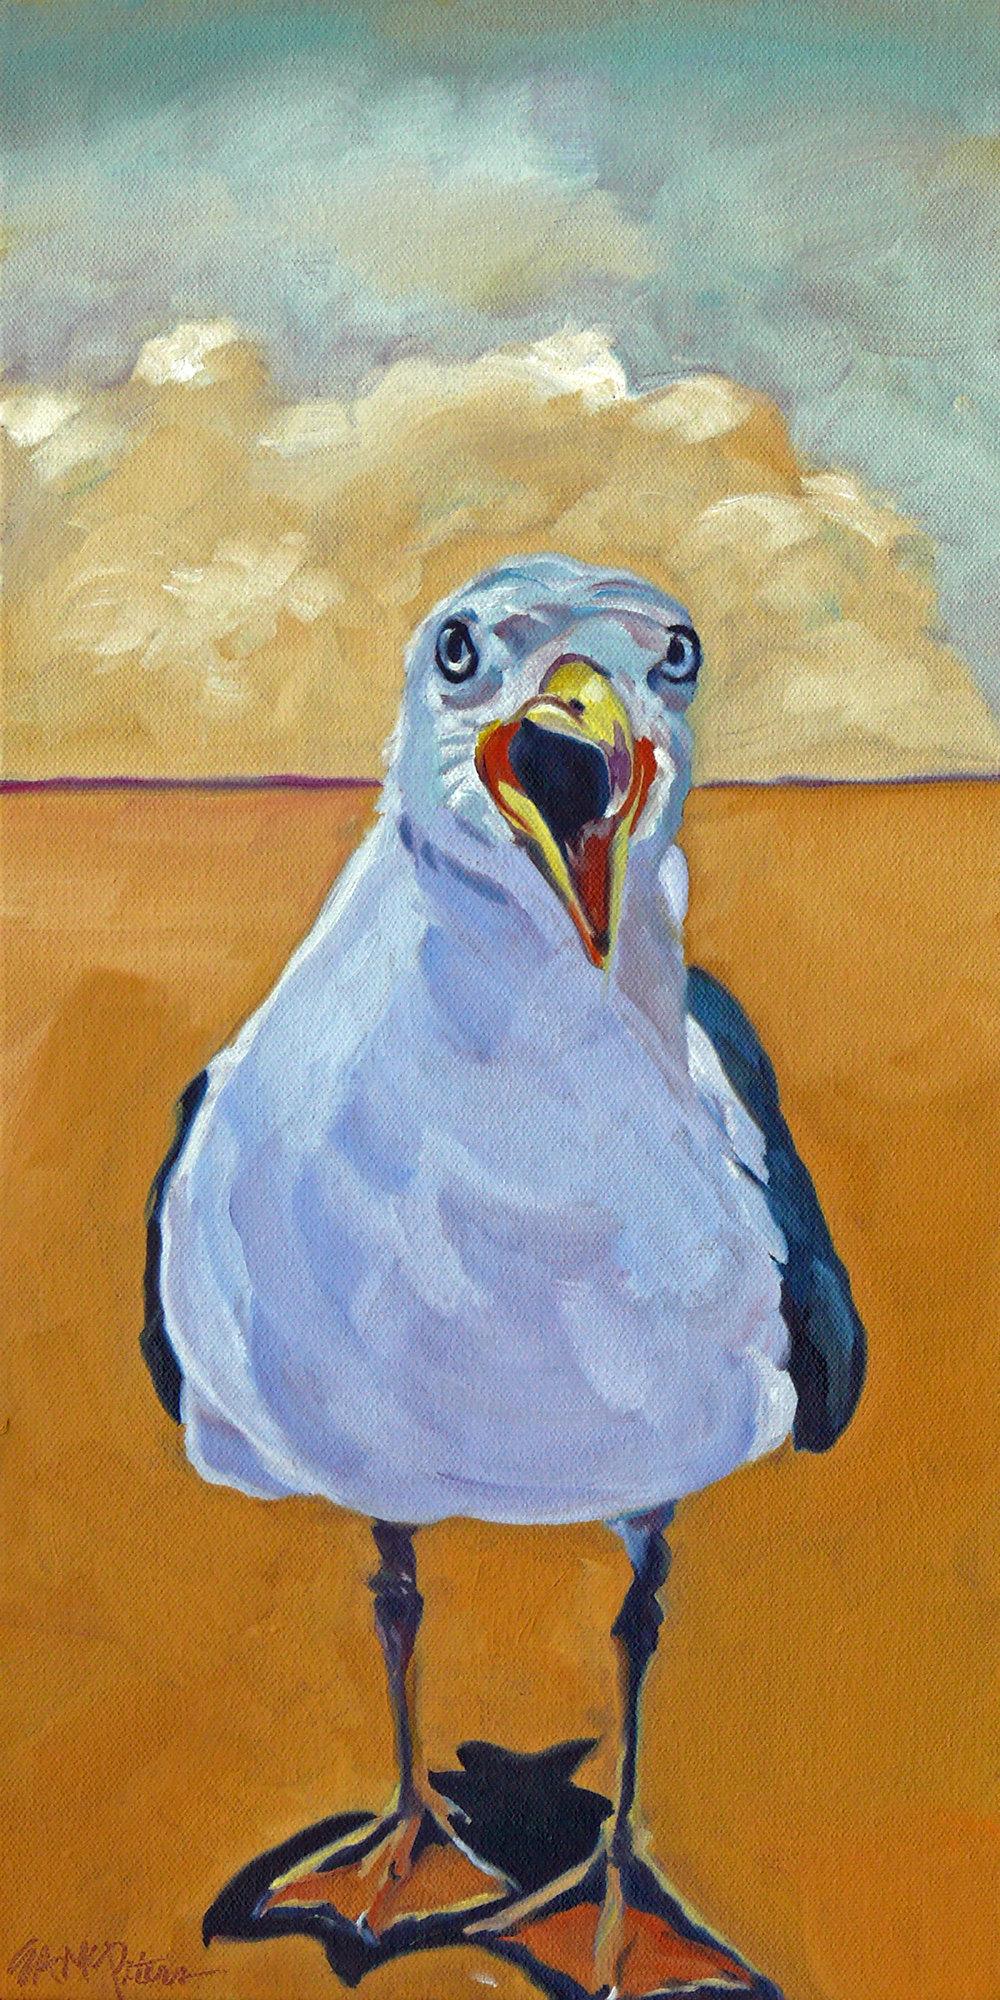 Crying Gull Evelyn McCorristin Peters 1500.jpg